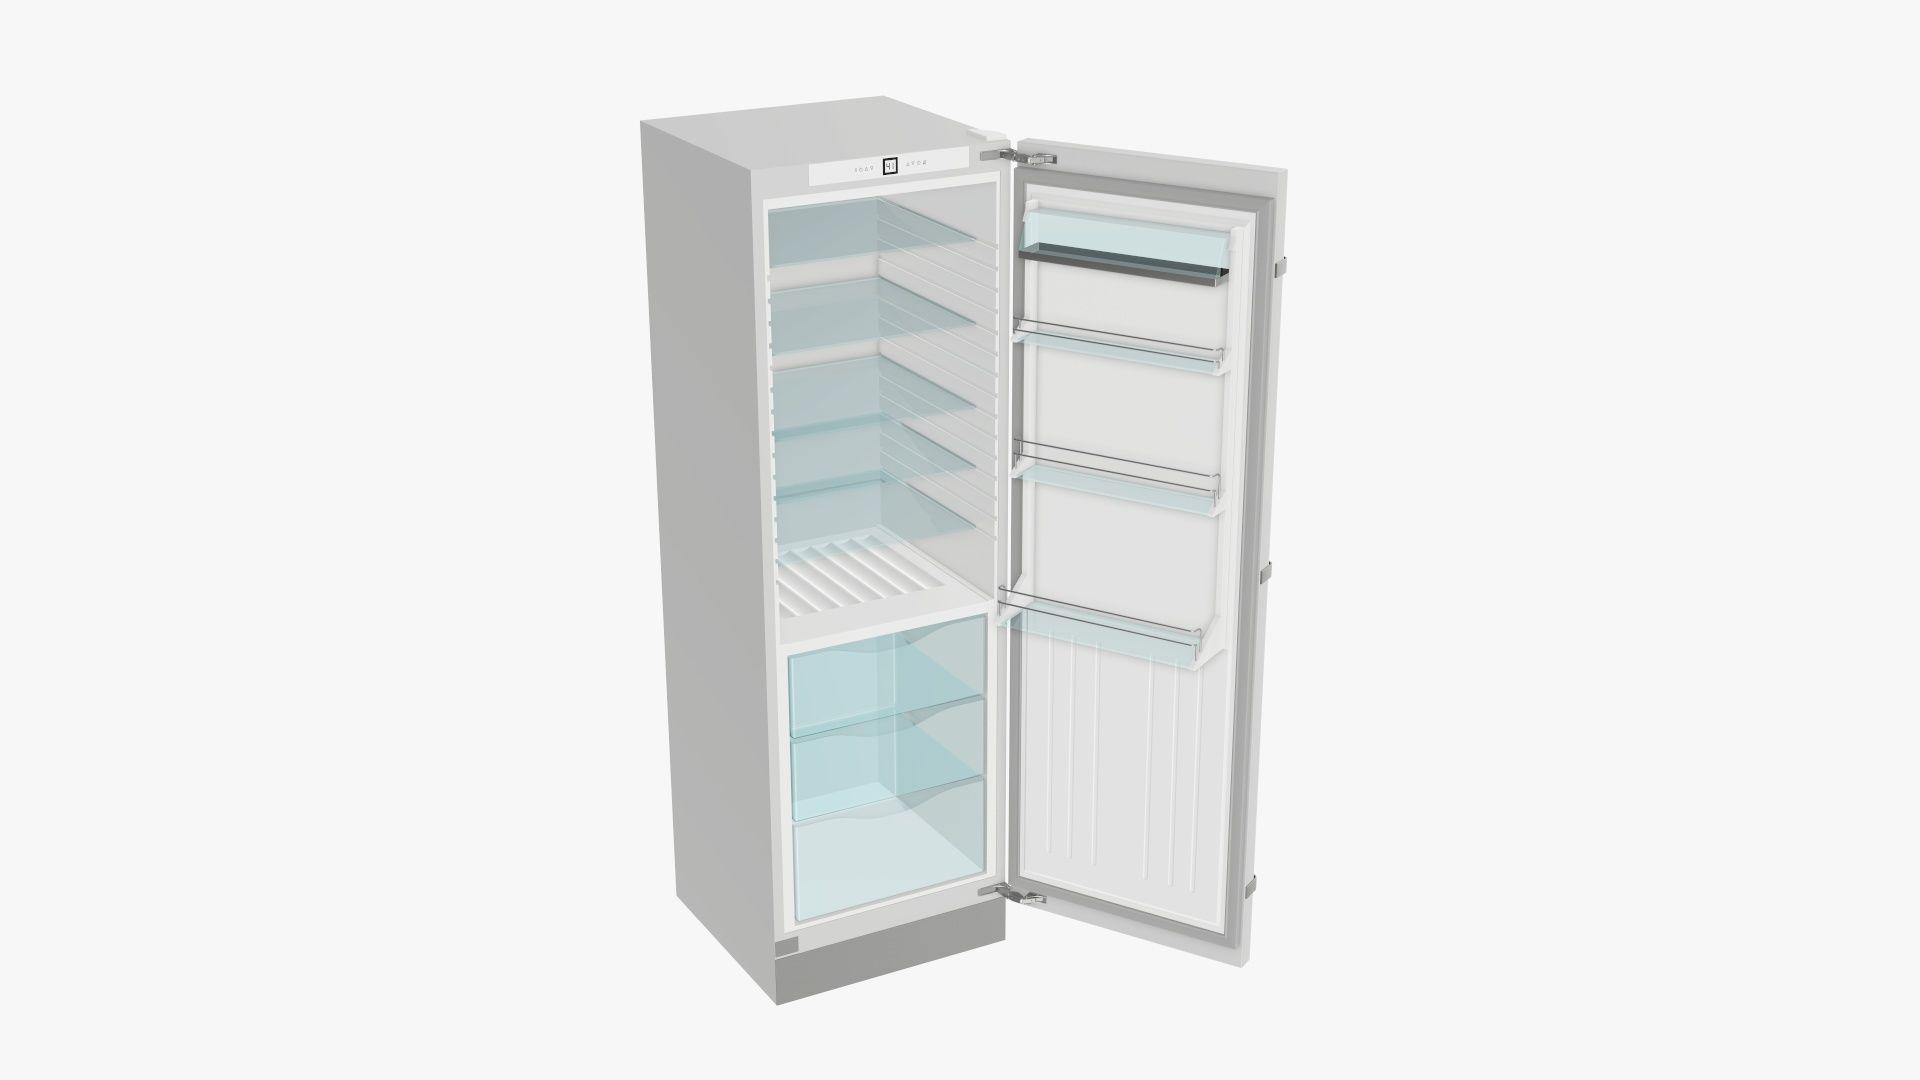 Refrigerator free-standing opened